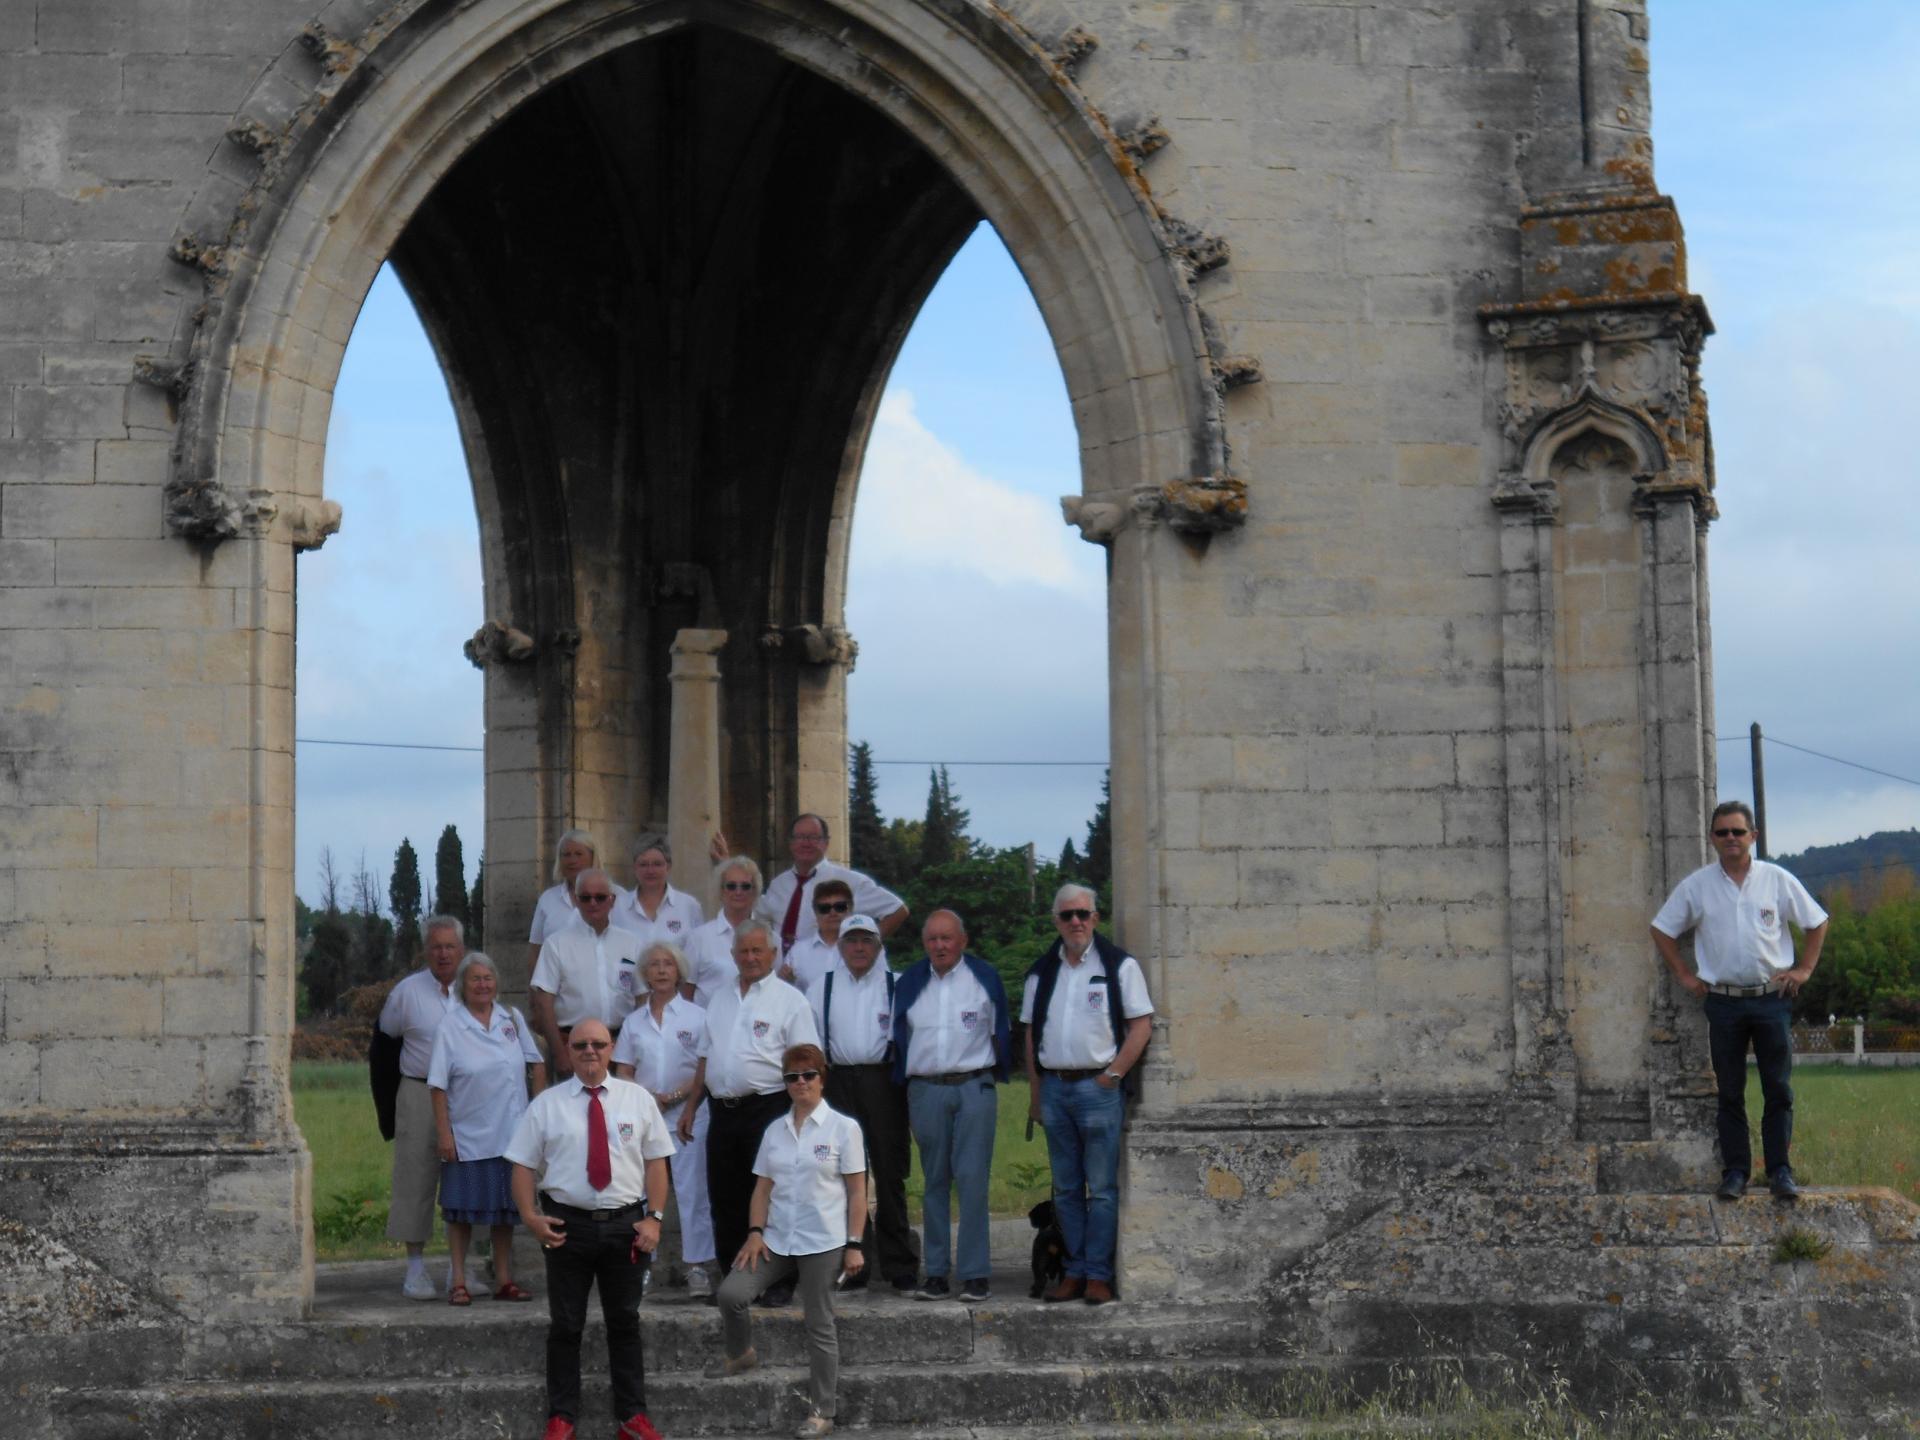 Jeudi 7 juin - l'Oratoire de la Croix couverte